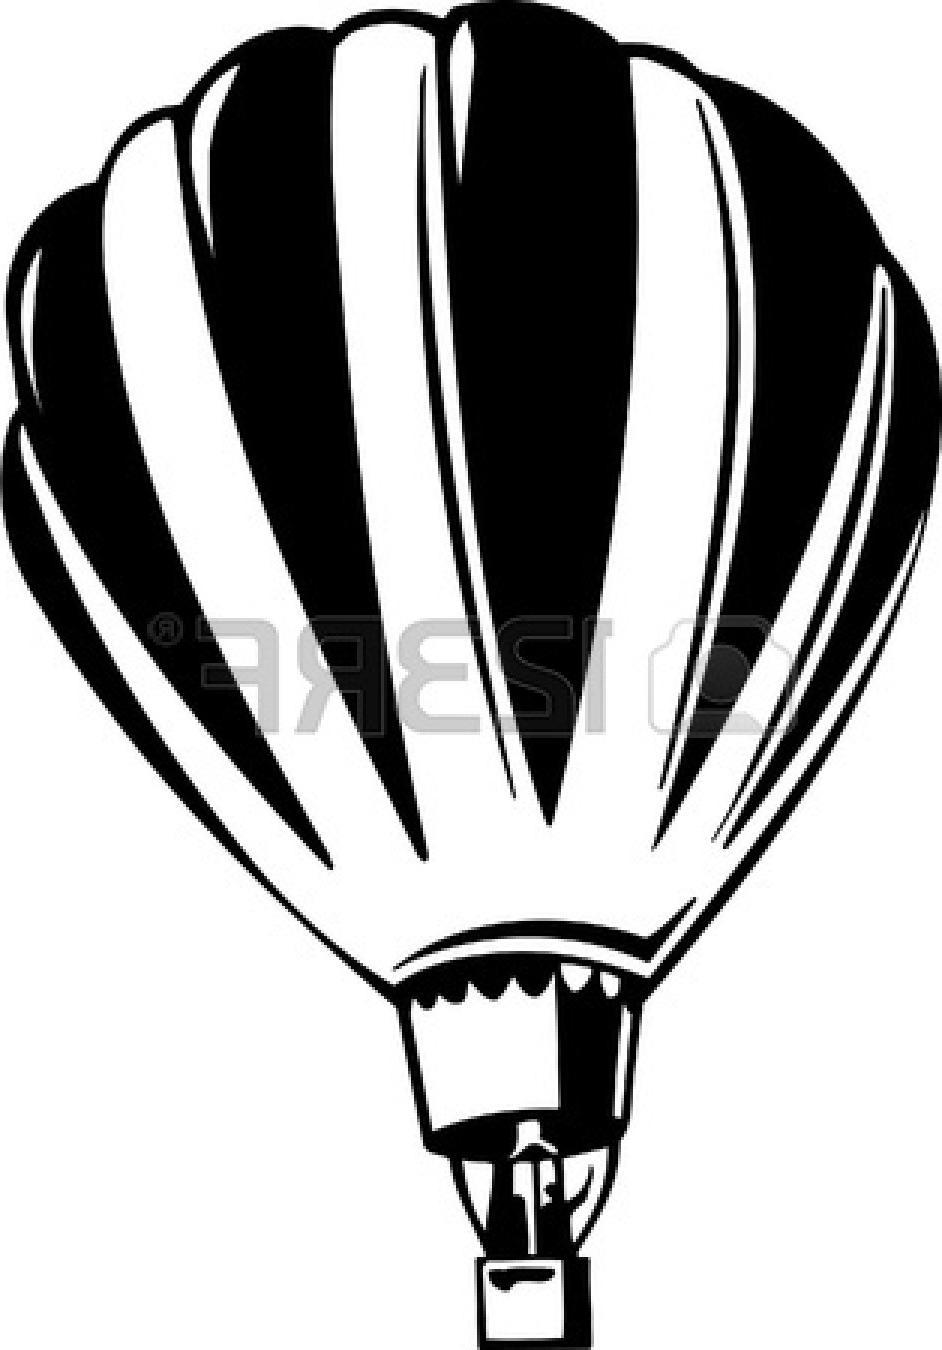 942x1350 Unique Vintage Hot Air Balloon Vector Vinyl Ready File Free